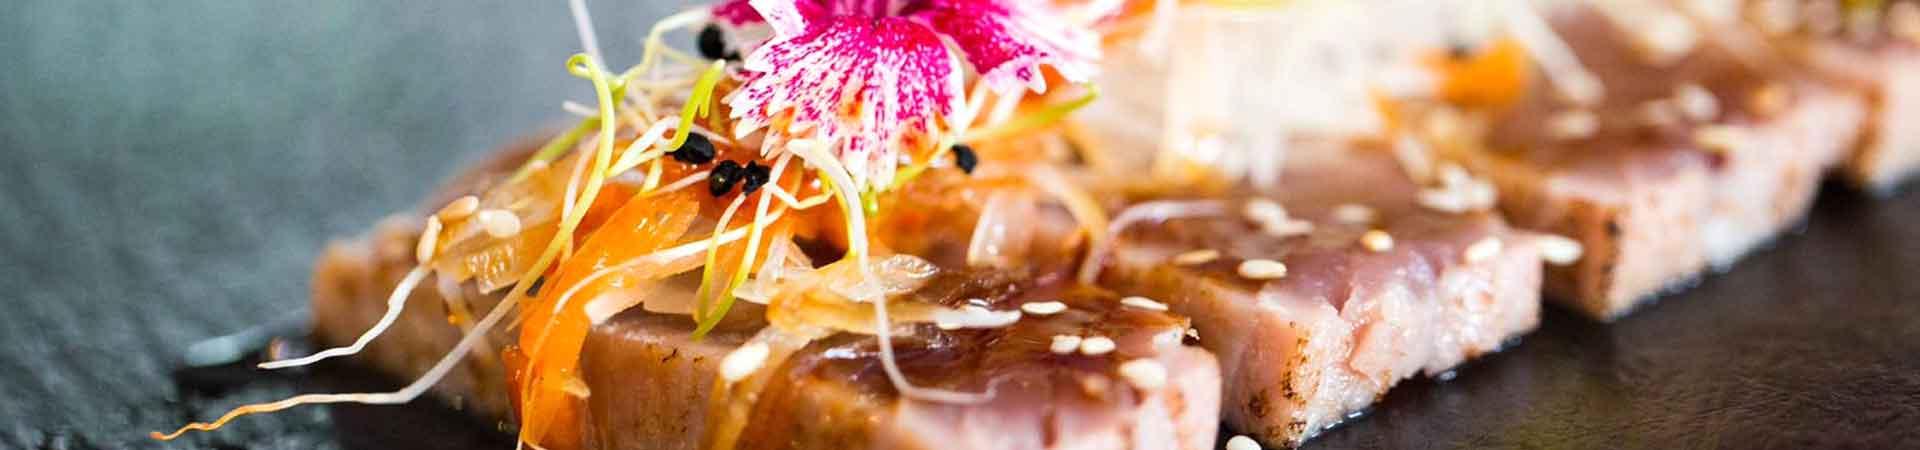 https://www.goodmorningtenerife.com/wp-content/uploads/2019/05/02_slide_deba-sushi-lounge-good-morning-tenerife-1950.jpg